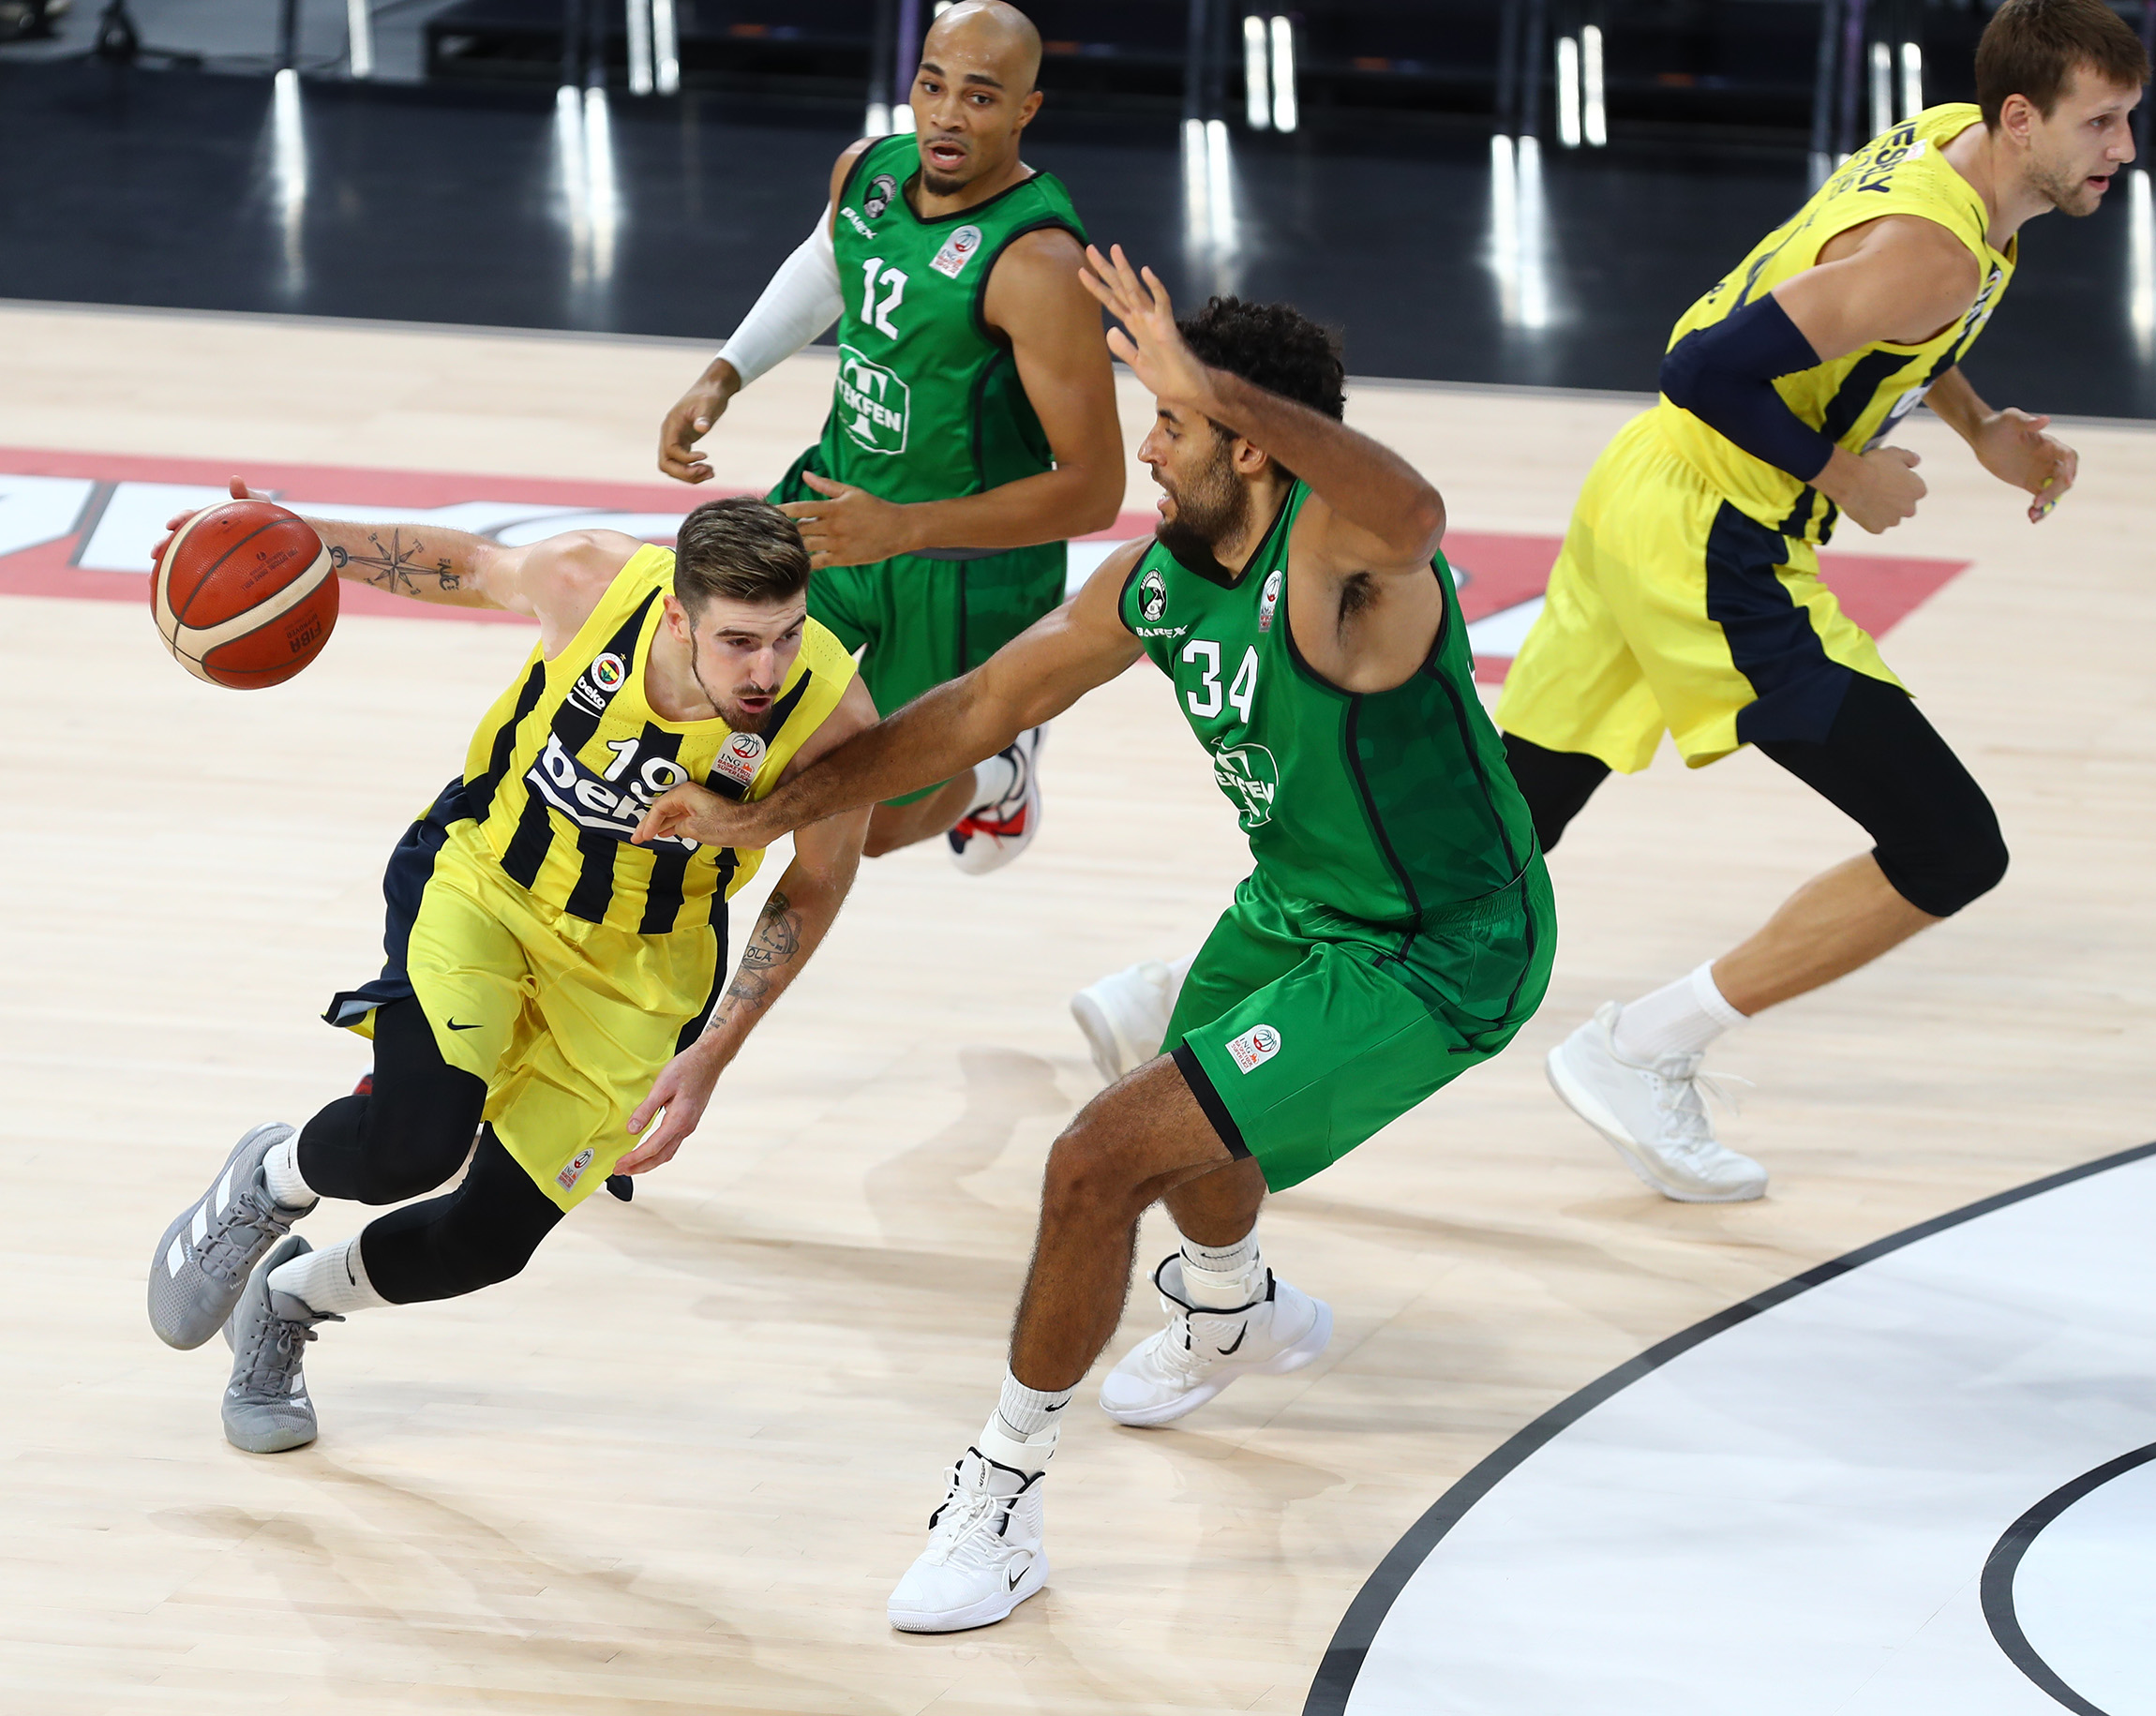 Turnuva'da Kazanan Fenerbahçe Beko Oldu